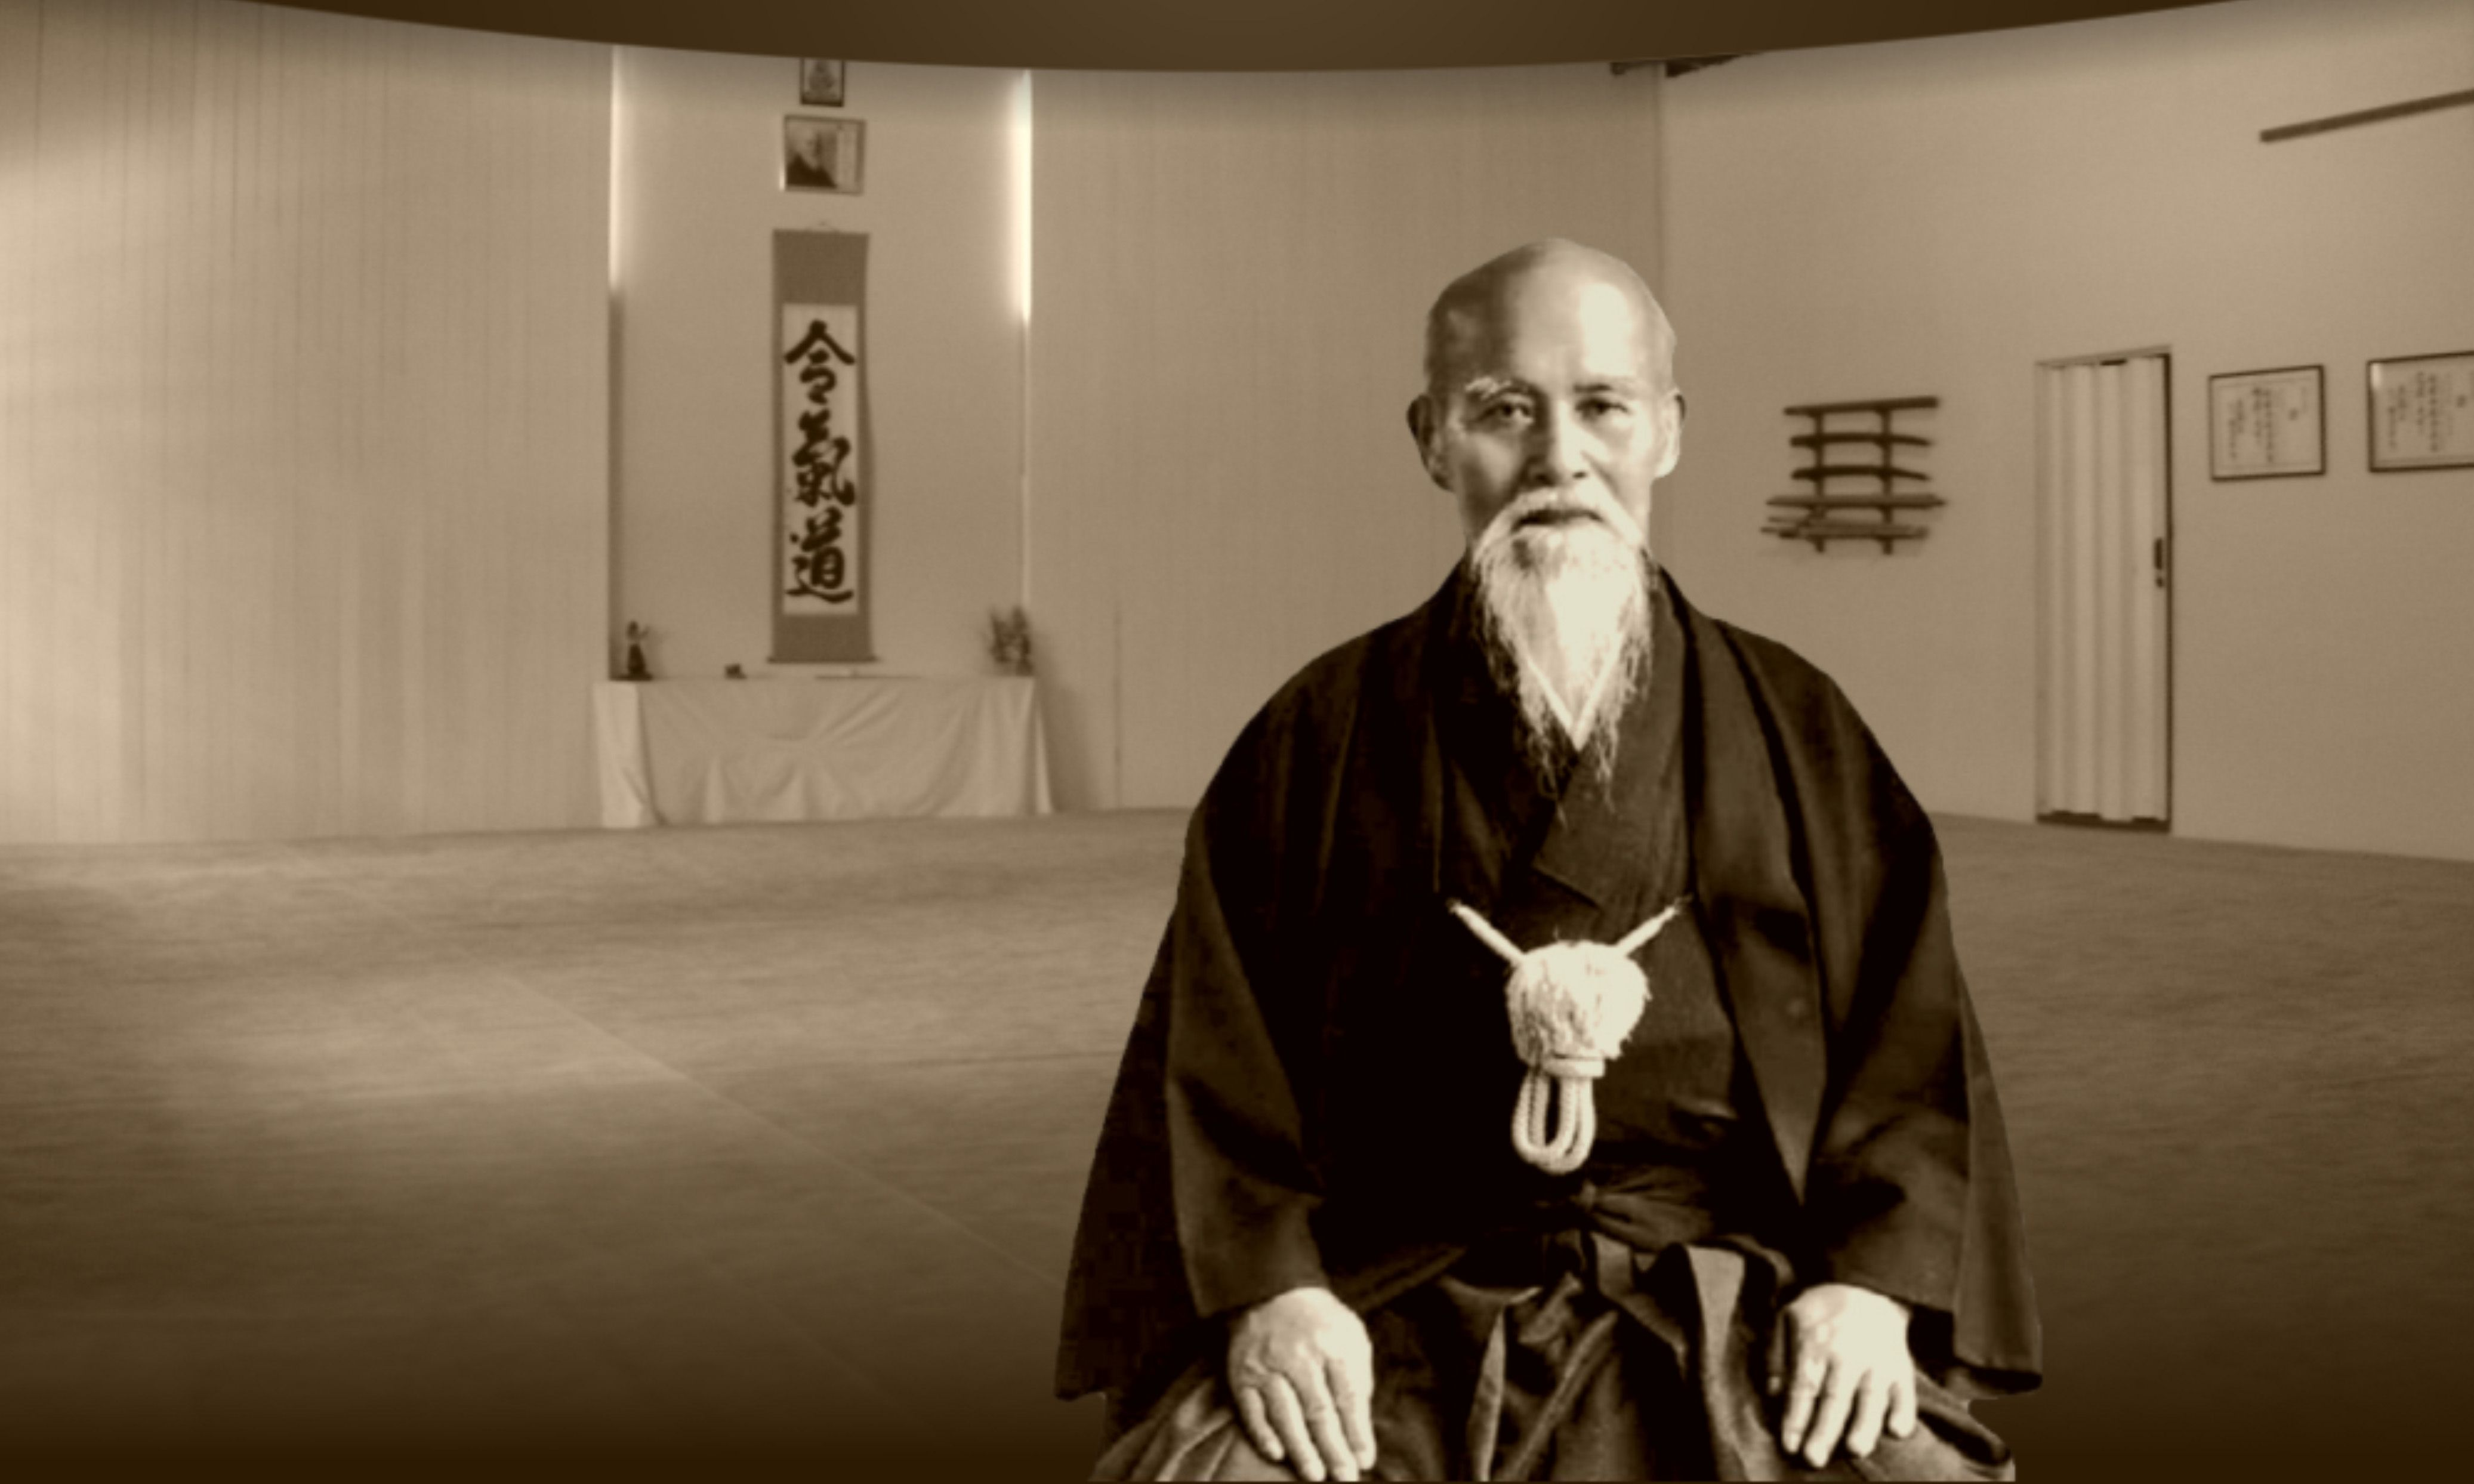 Morihei Ueshiba Sensei, founder of the Way of Harmony, Aikido.